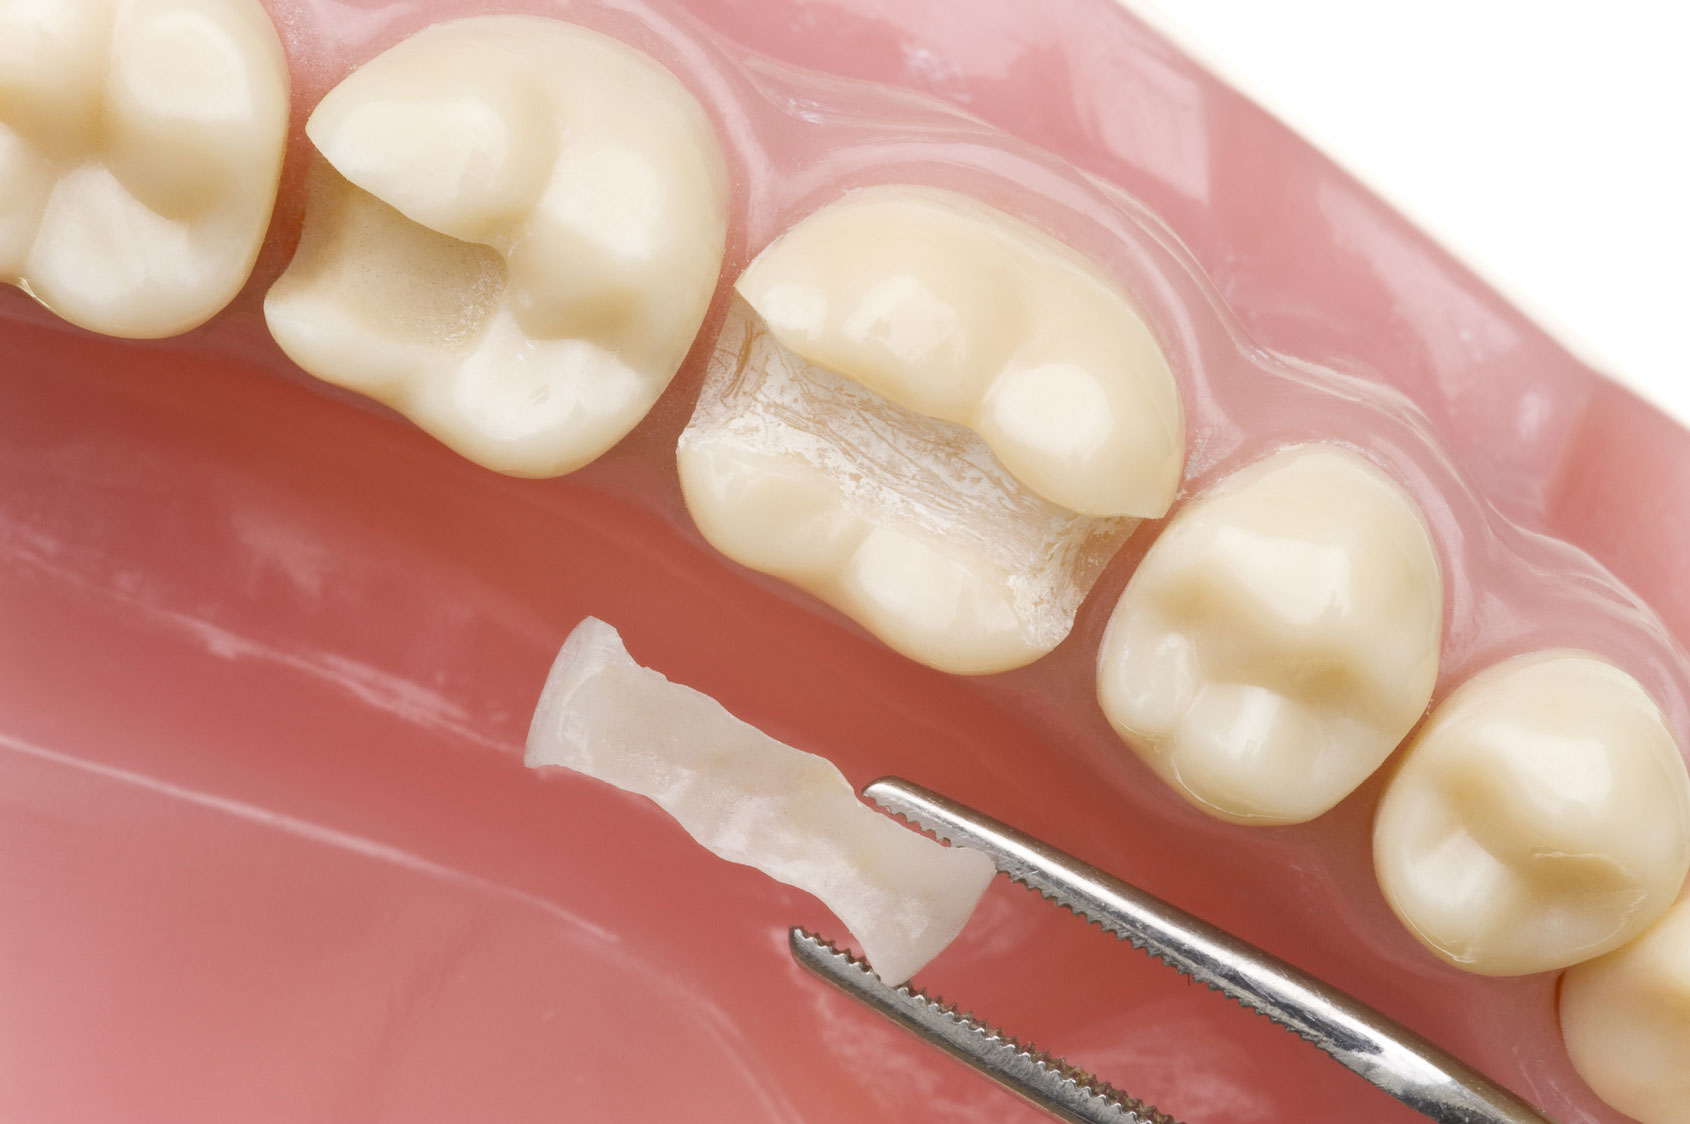 Kunststofffüllung beum Zahn